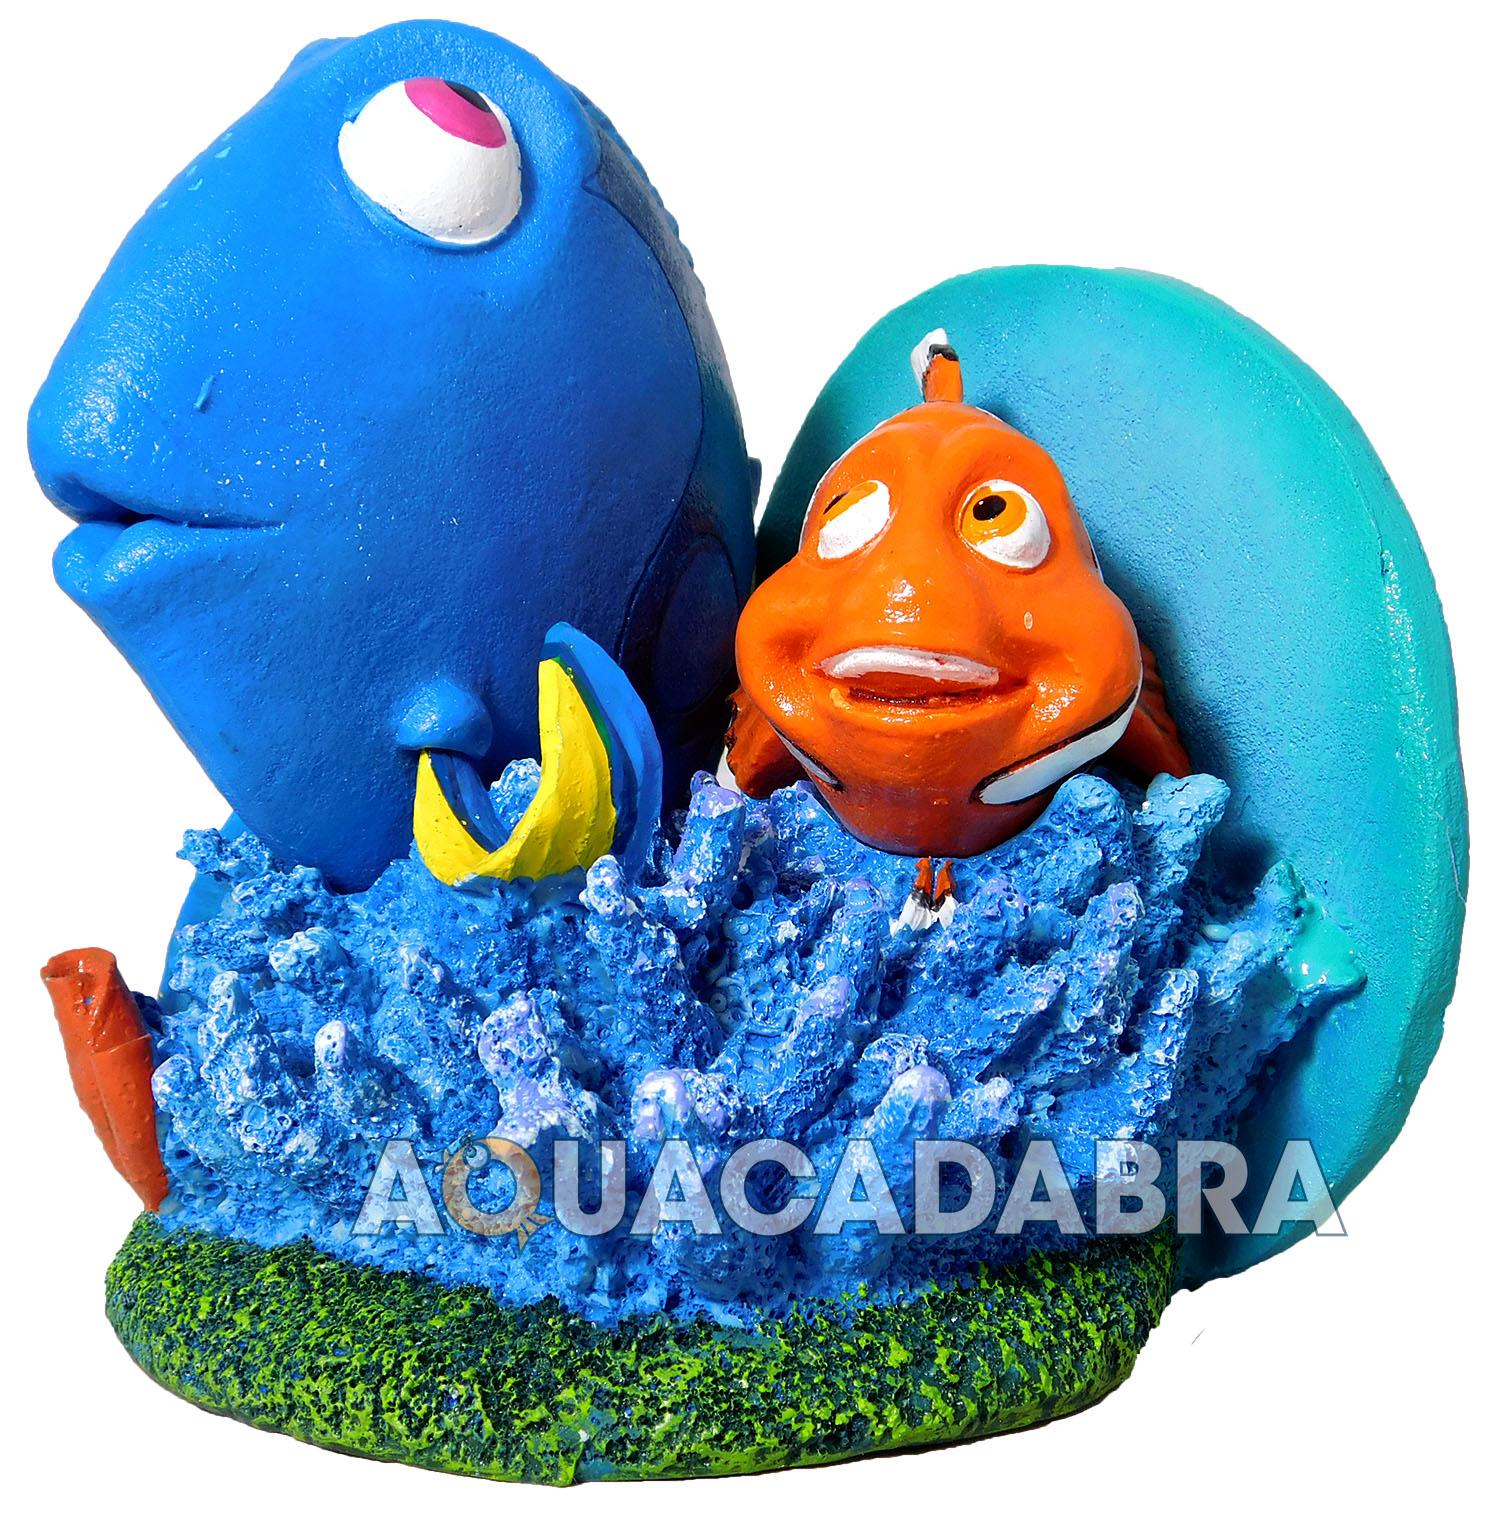 Finding dory aquarium ornaments marlin nemo disney pixar for Finding nemo fish